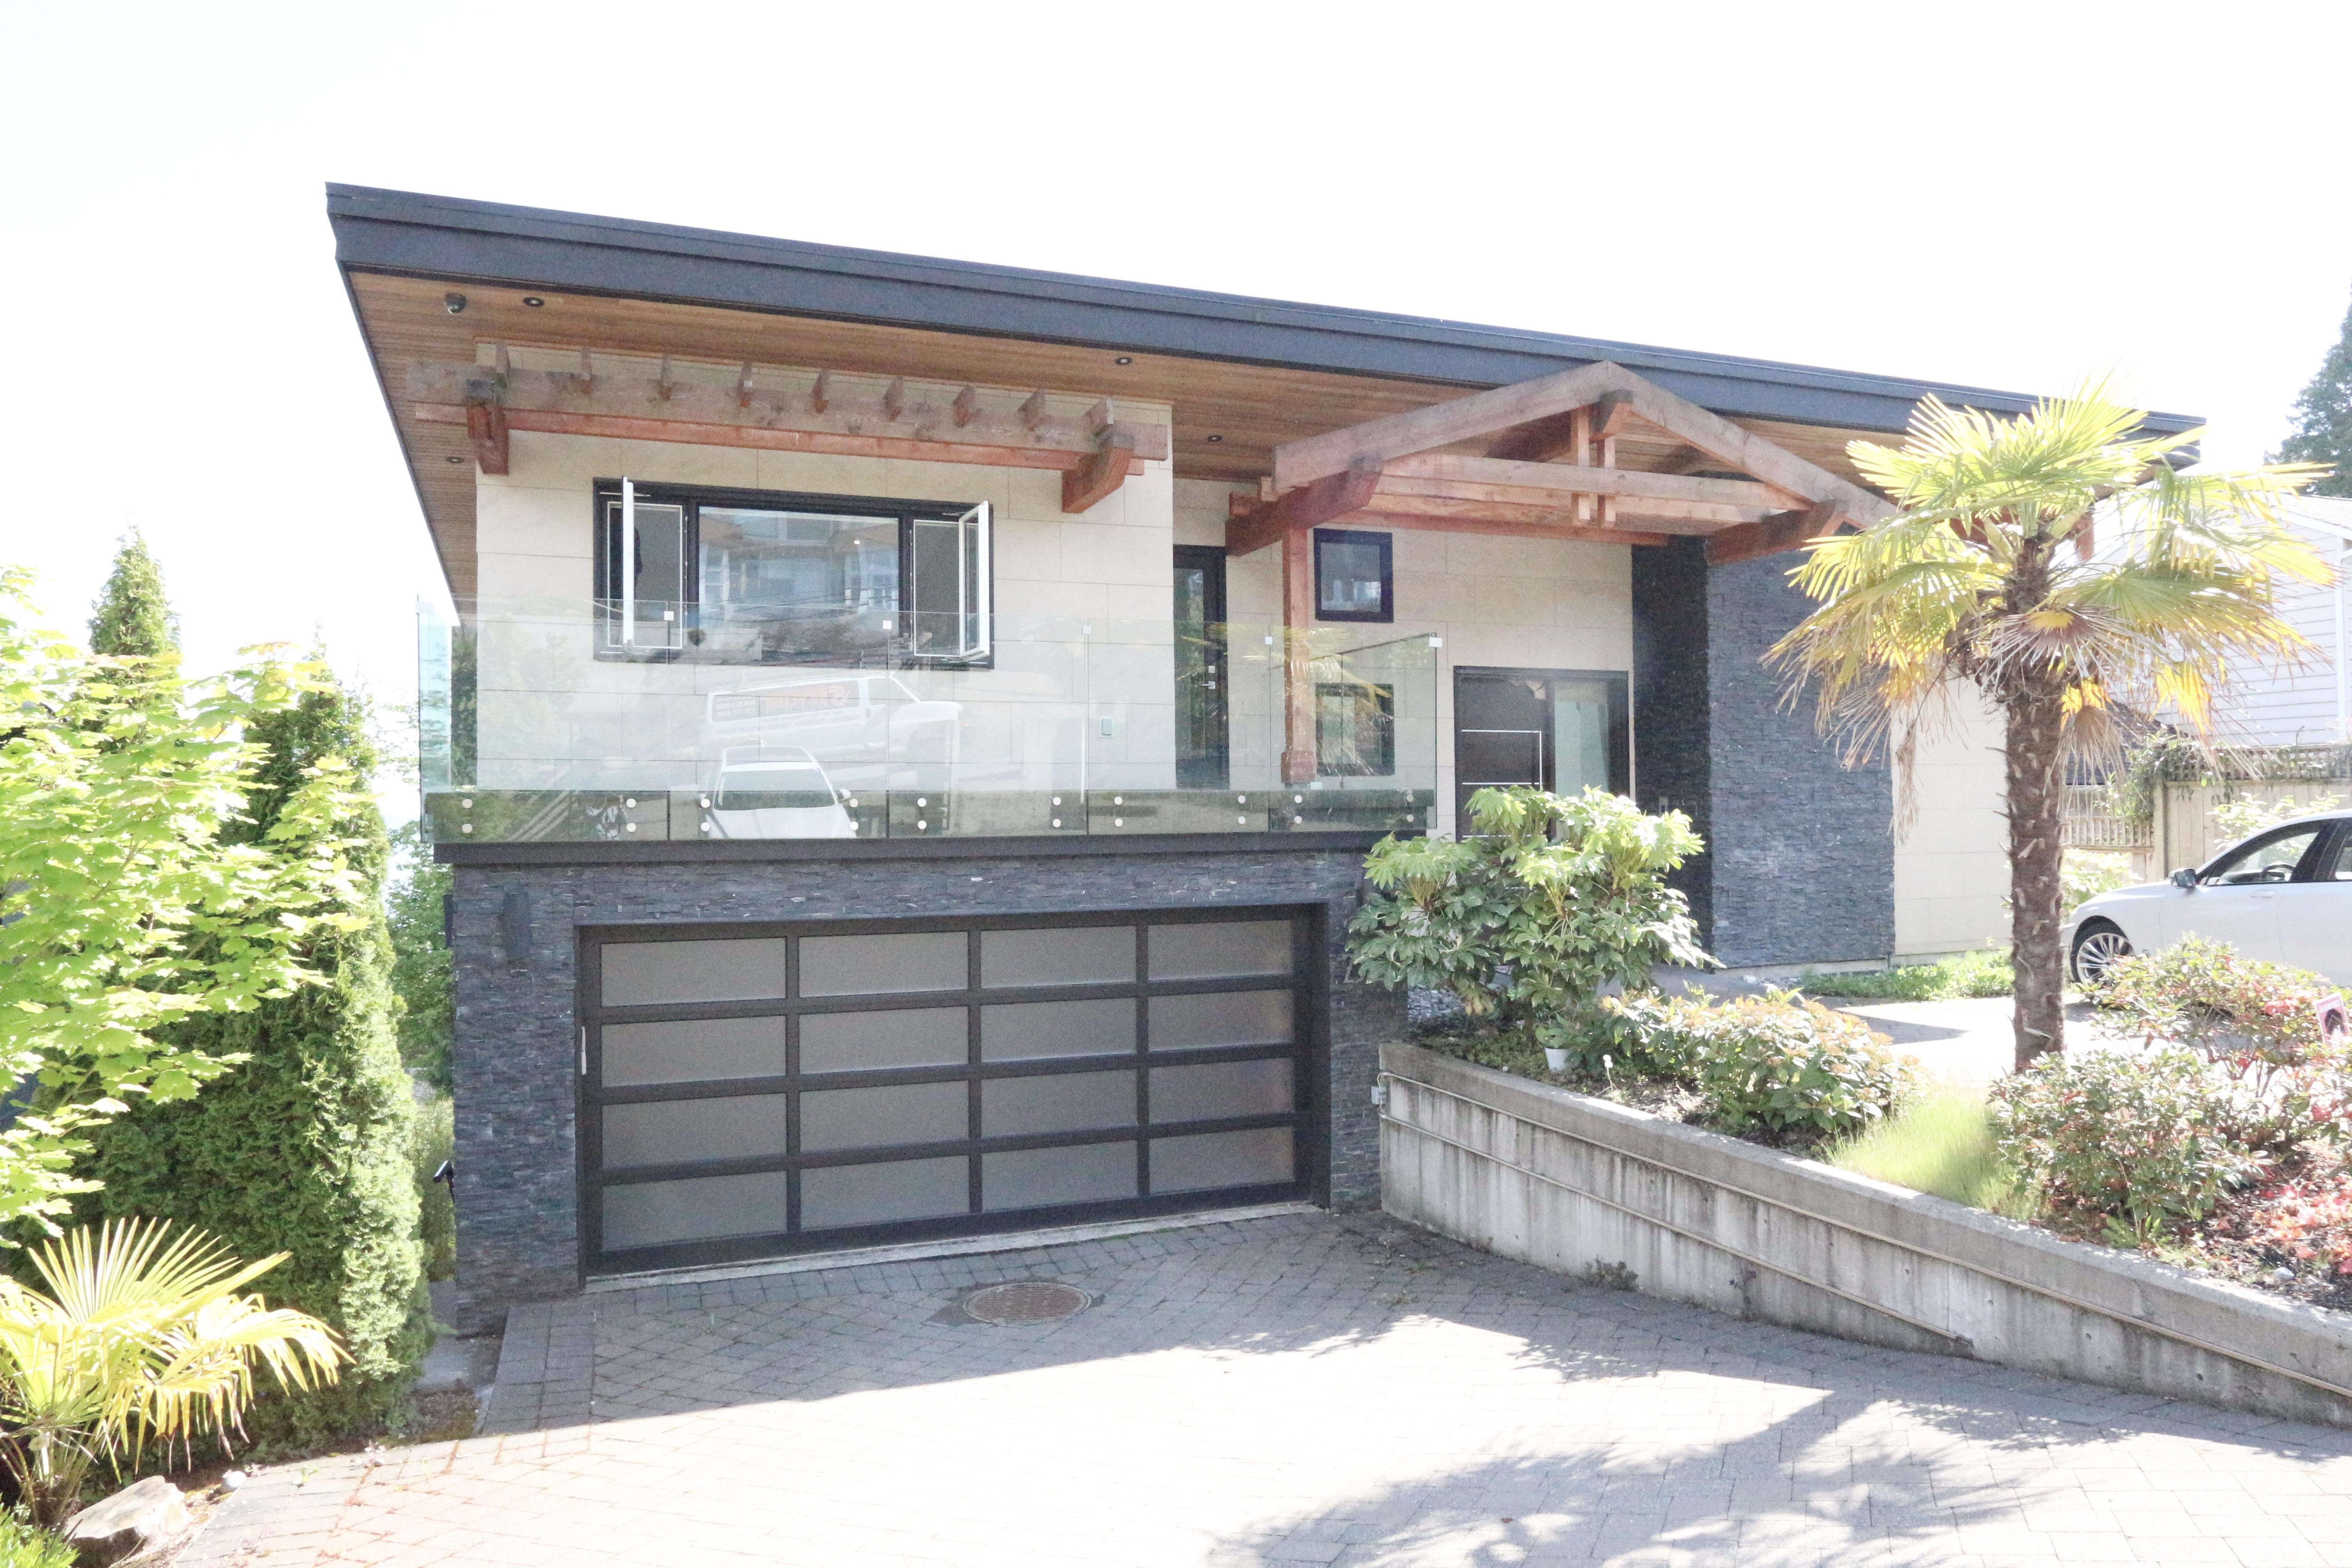 2512 Palmerston, Dundarave, West Vancouver 2